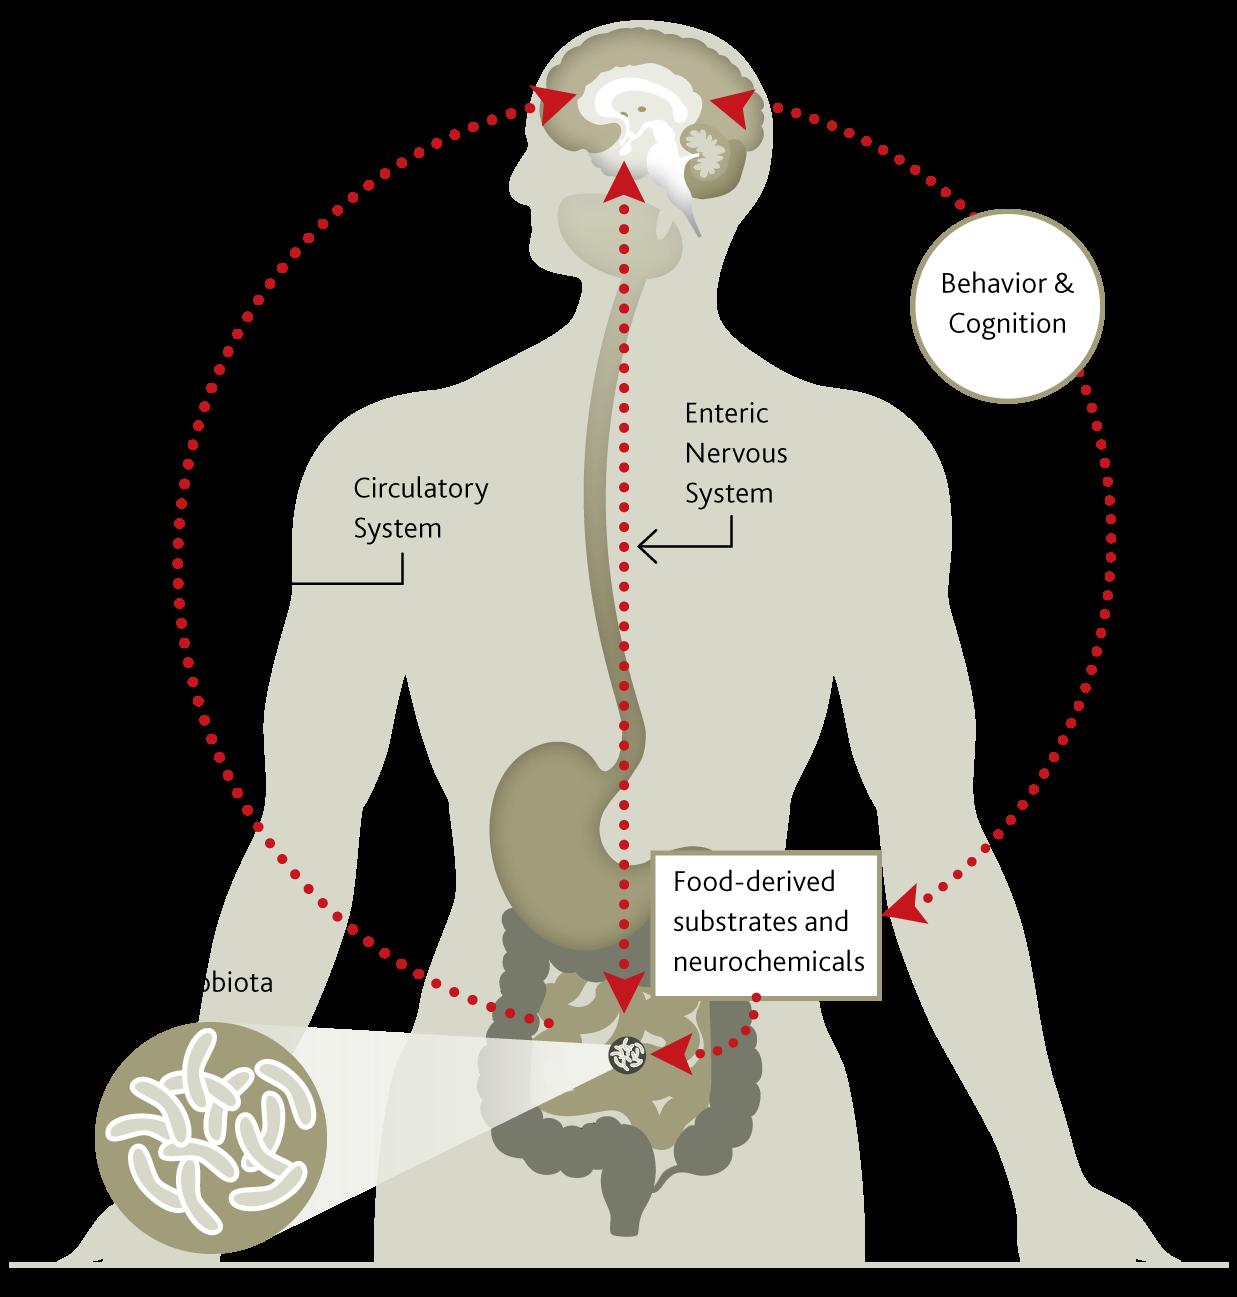 Microbes and brain share neurochemistry